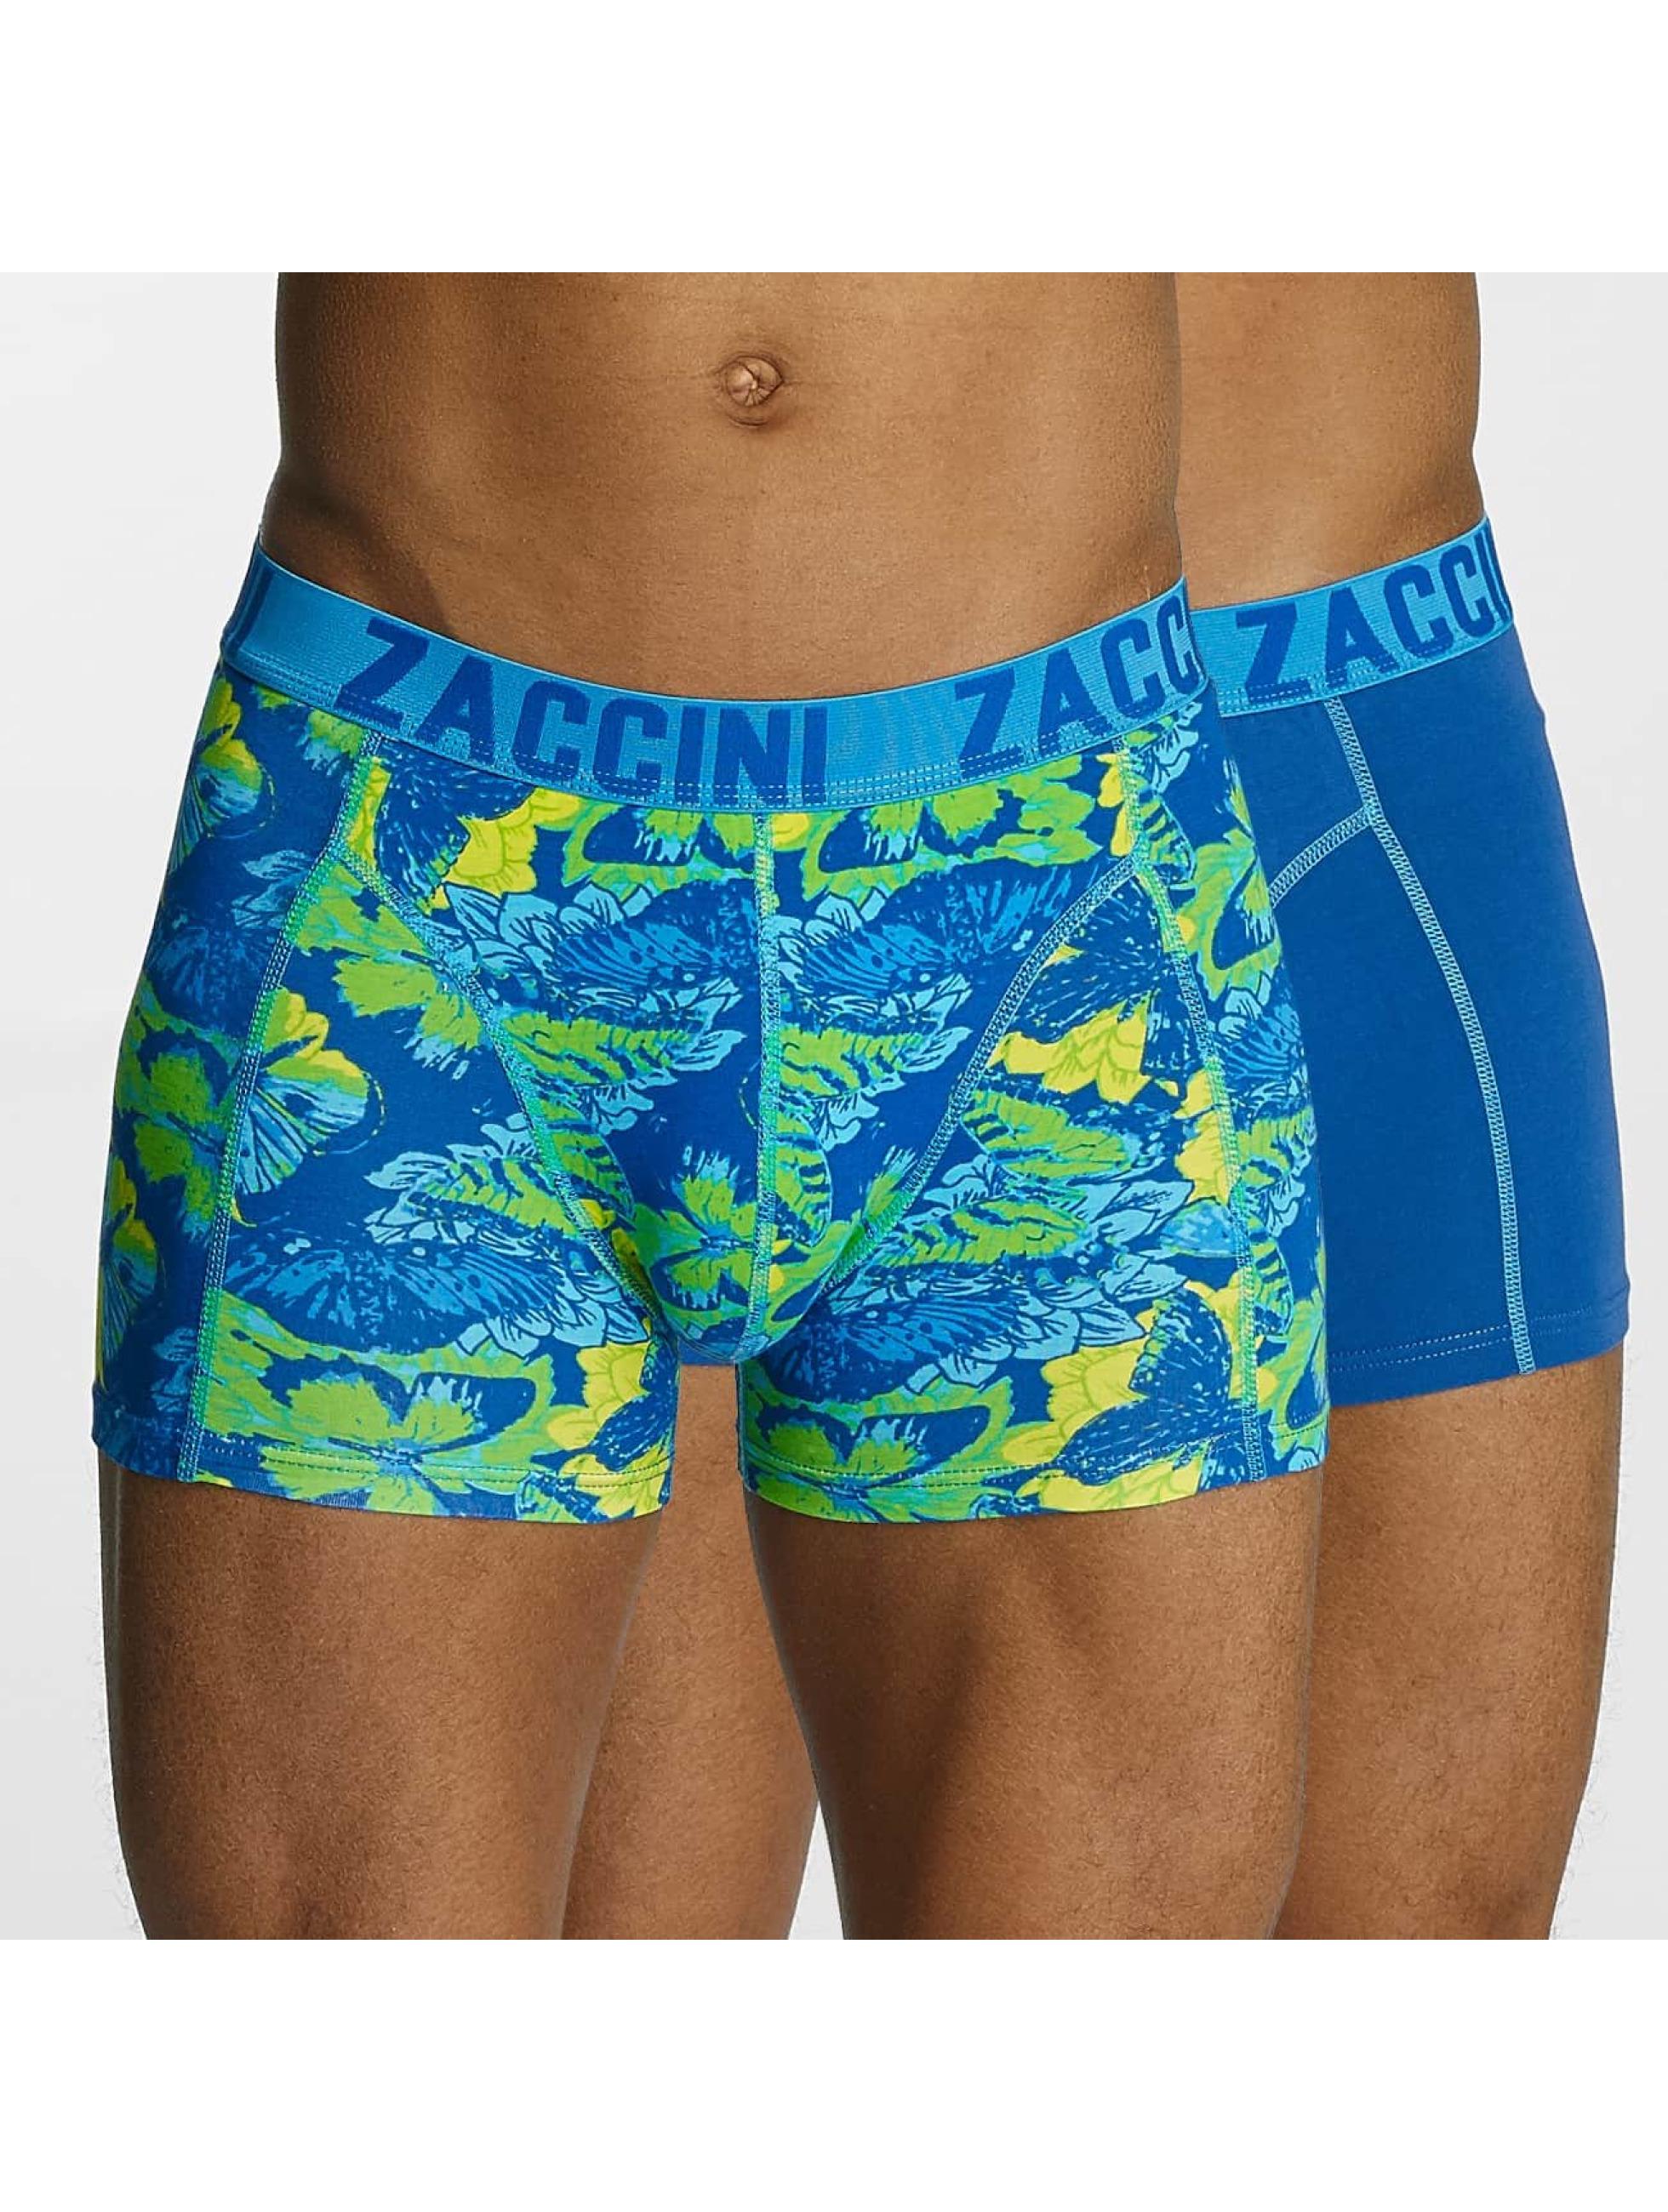 Zaccini Männer Boxershorts Summer Butterfly in blau